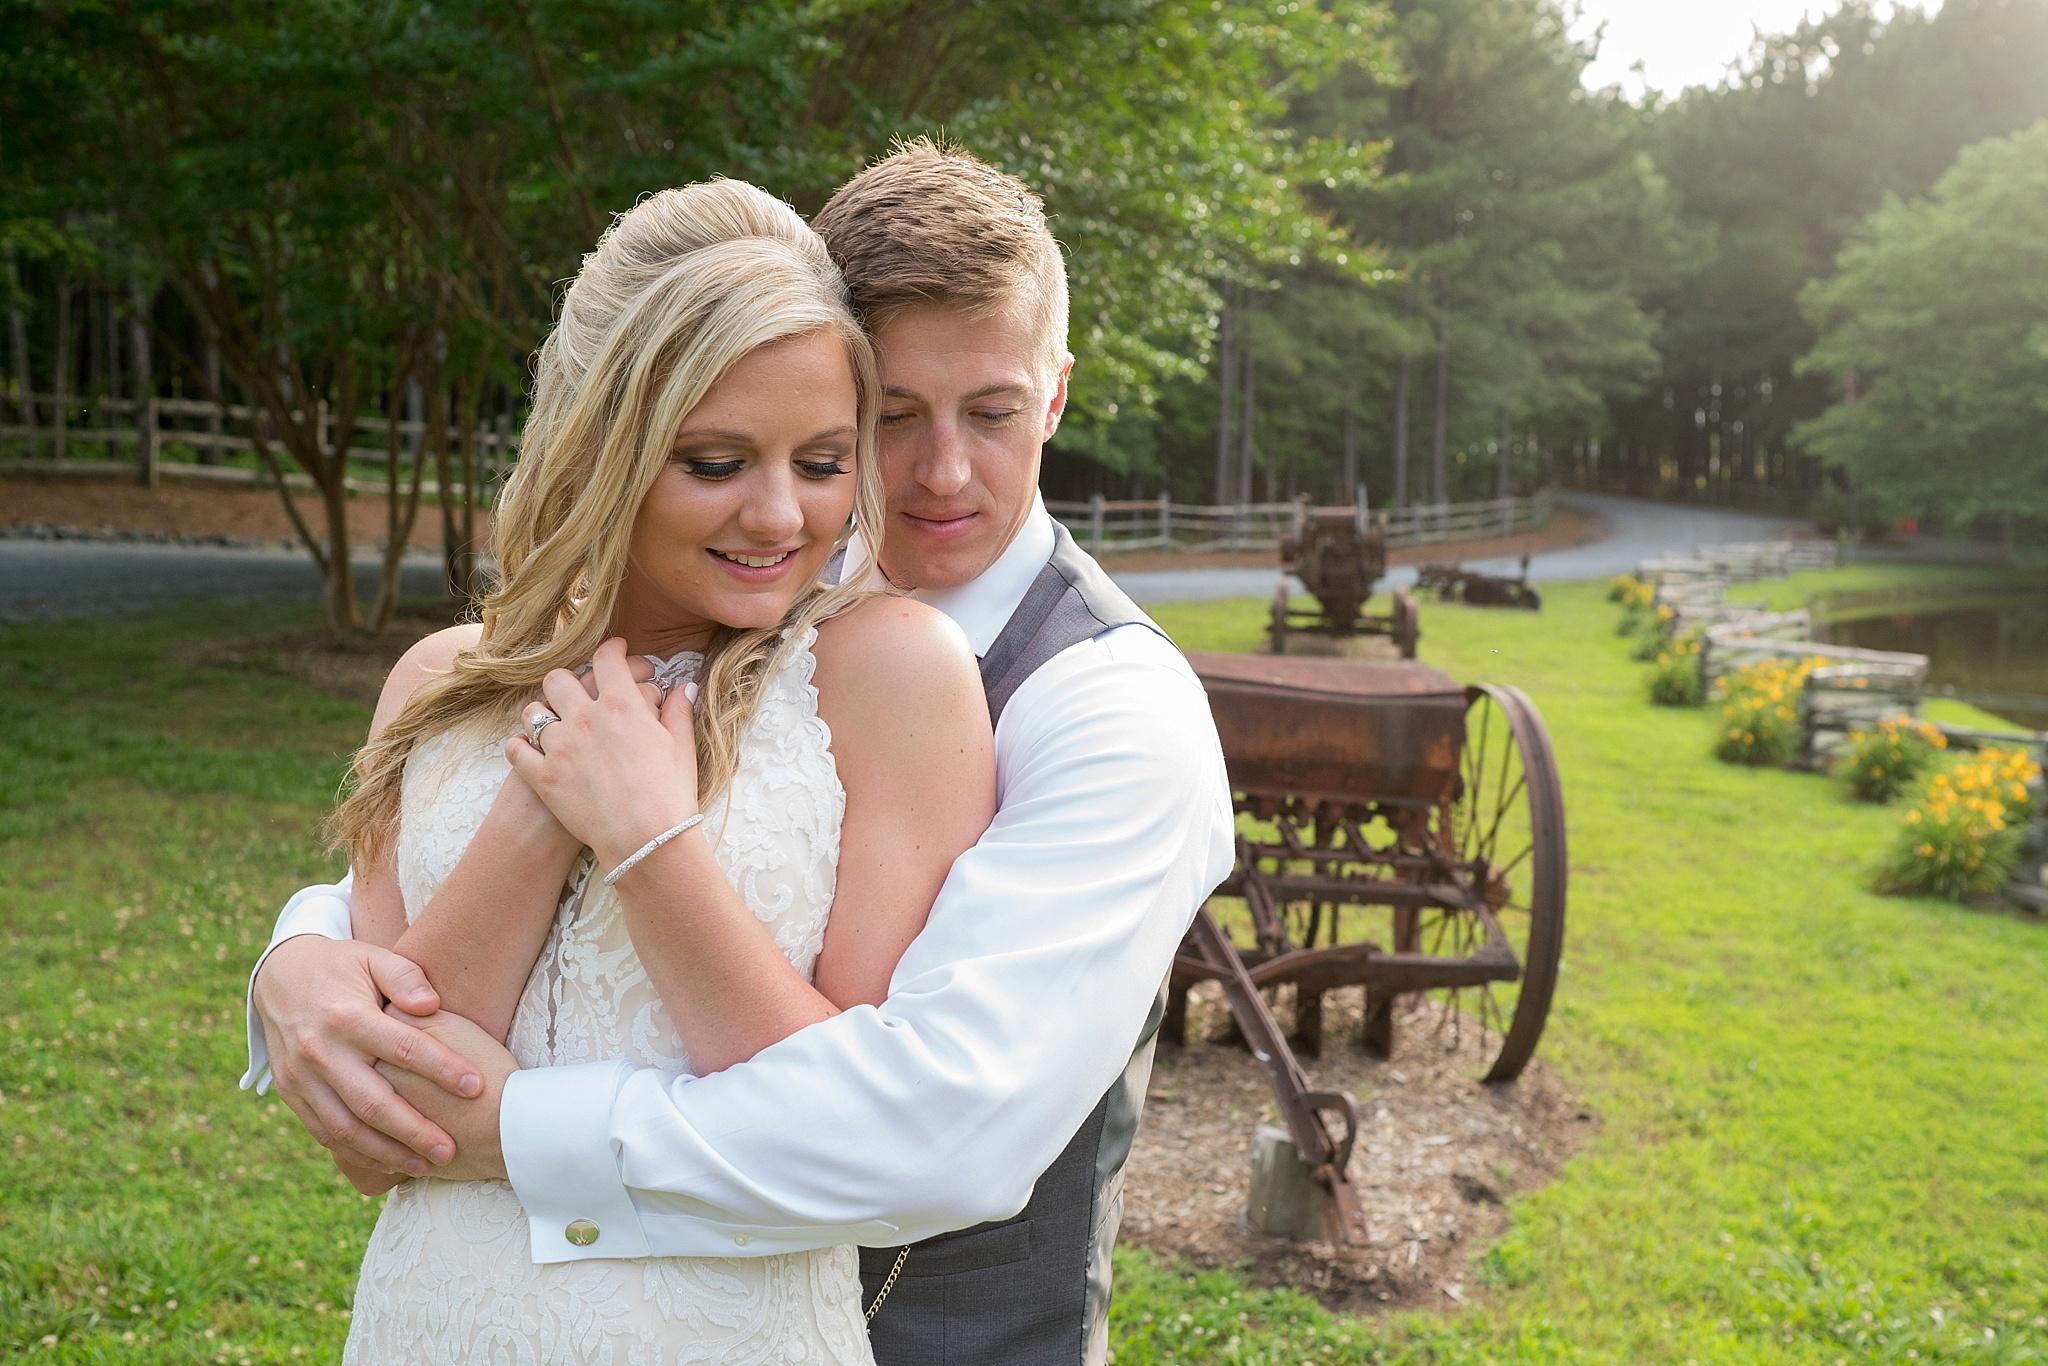 Shady-Wagon-Farm-NC-Wedding-Photographer-0184.jpg